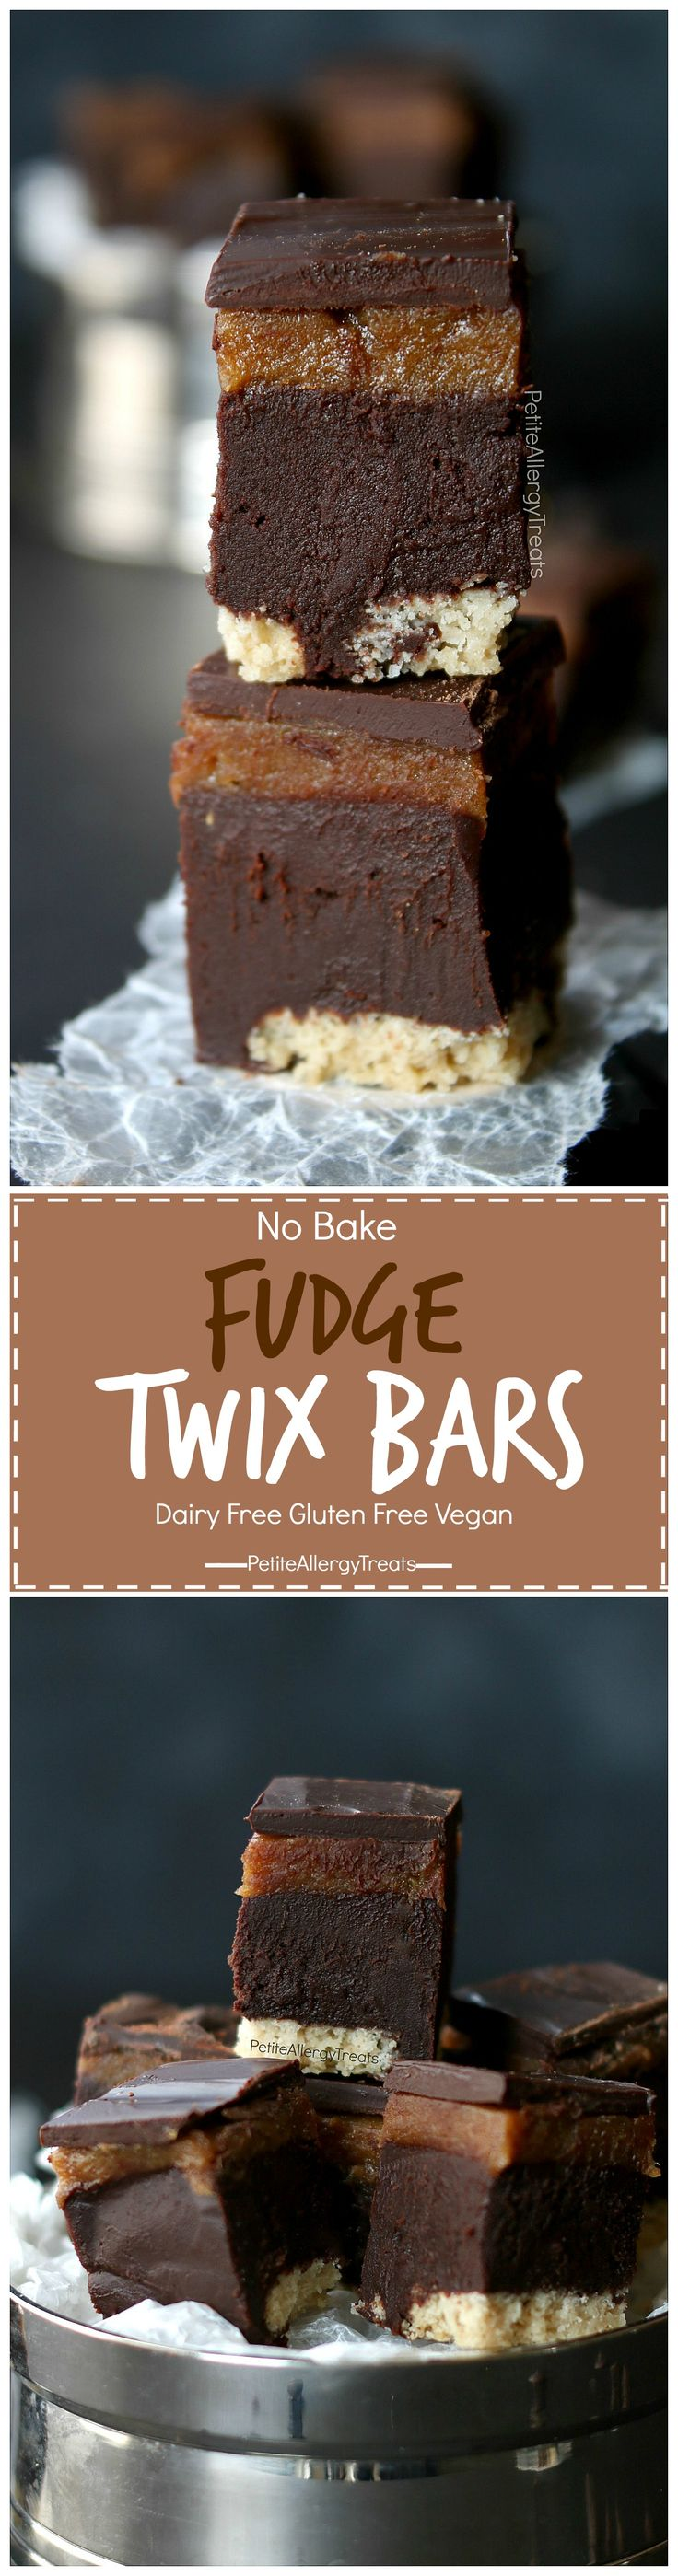 No bake Twix Fudge Bars Recipe (gluten free dairy free Vegan)- Healthier oil free ganache fudge filling and date caramel. Food Allergy friendly!